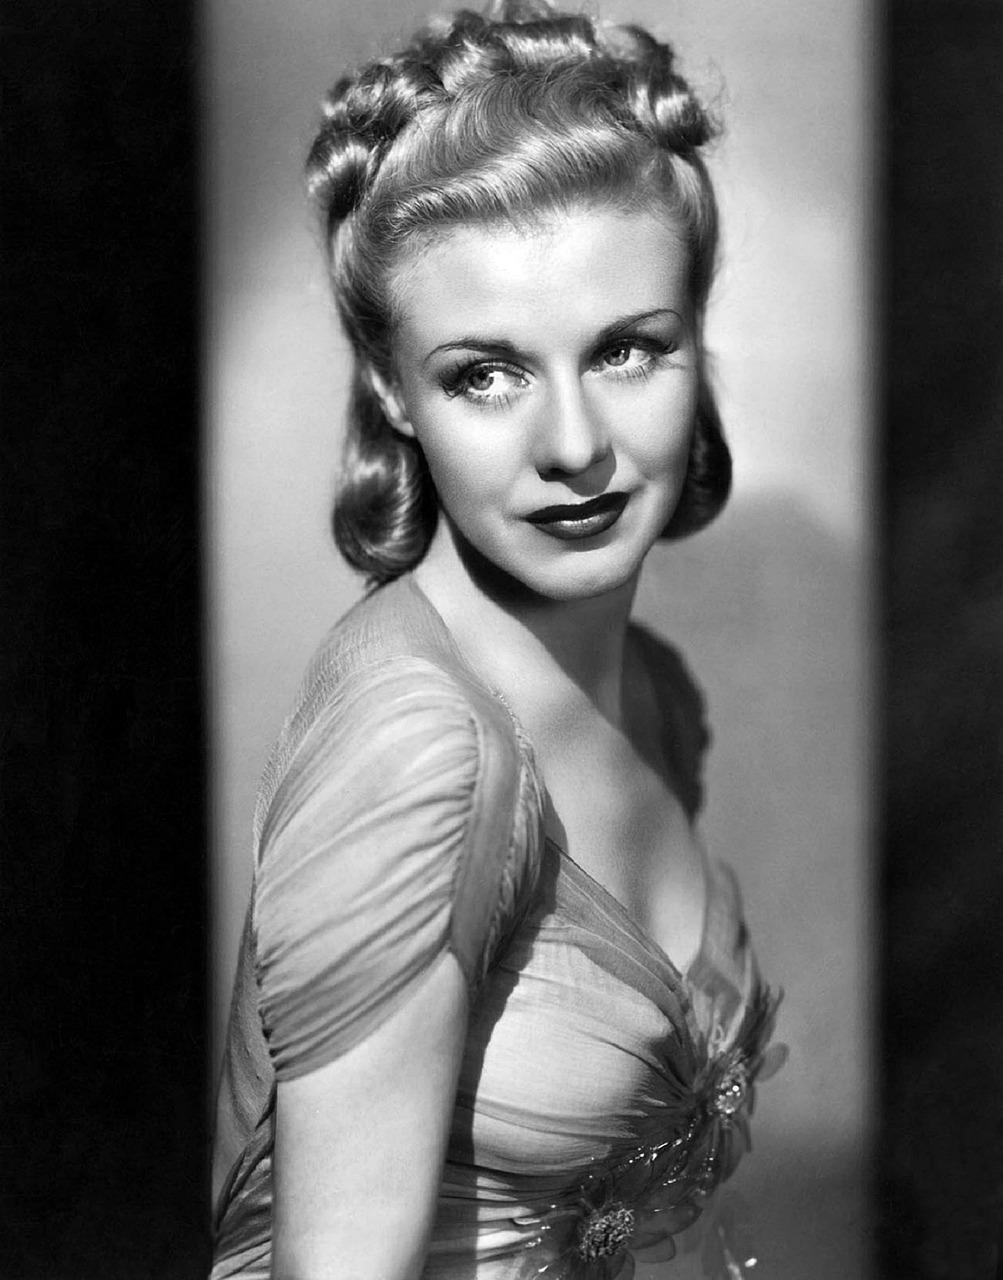 Ginger Rogers (1911-1995)